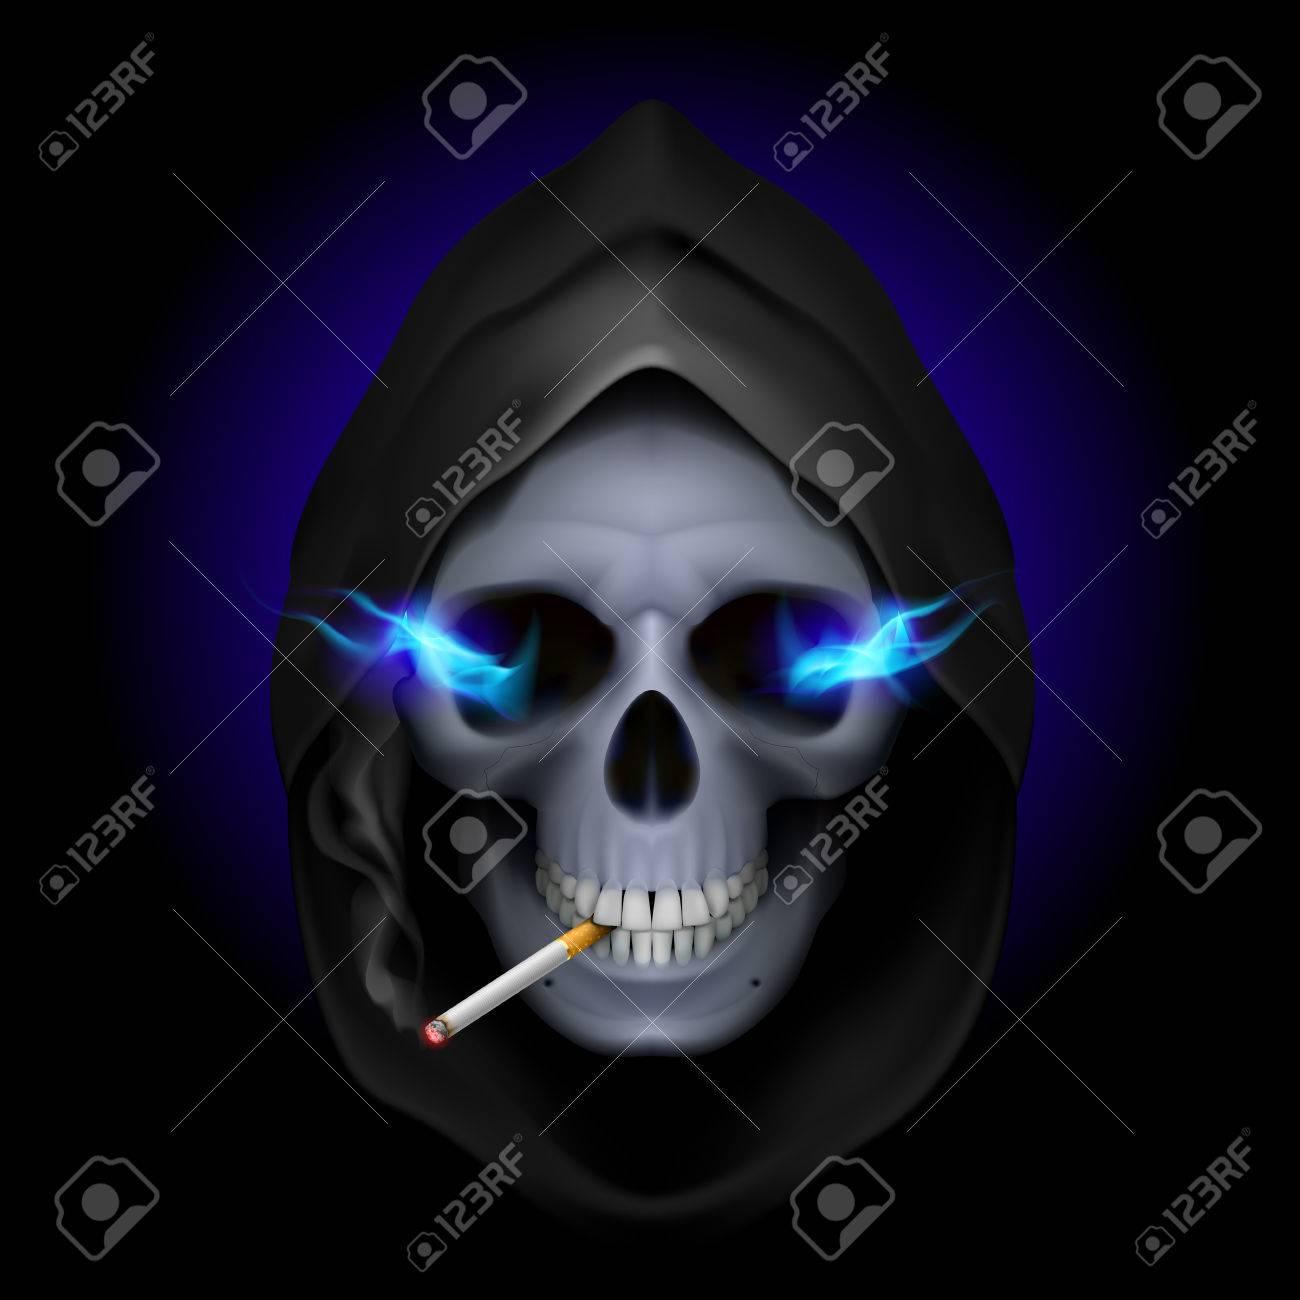 smoking kills death image